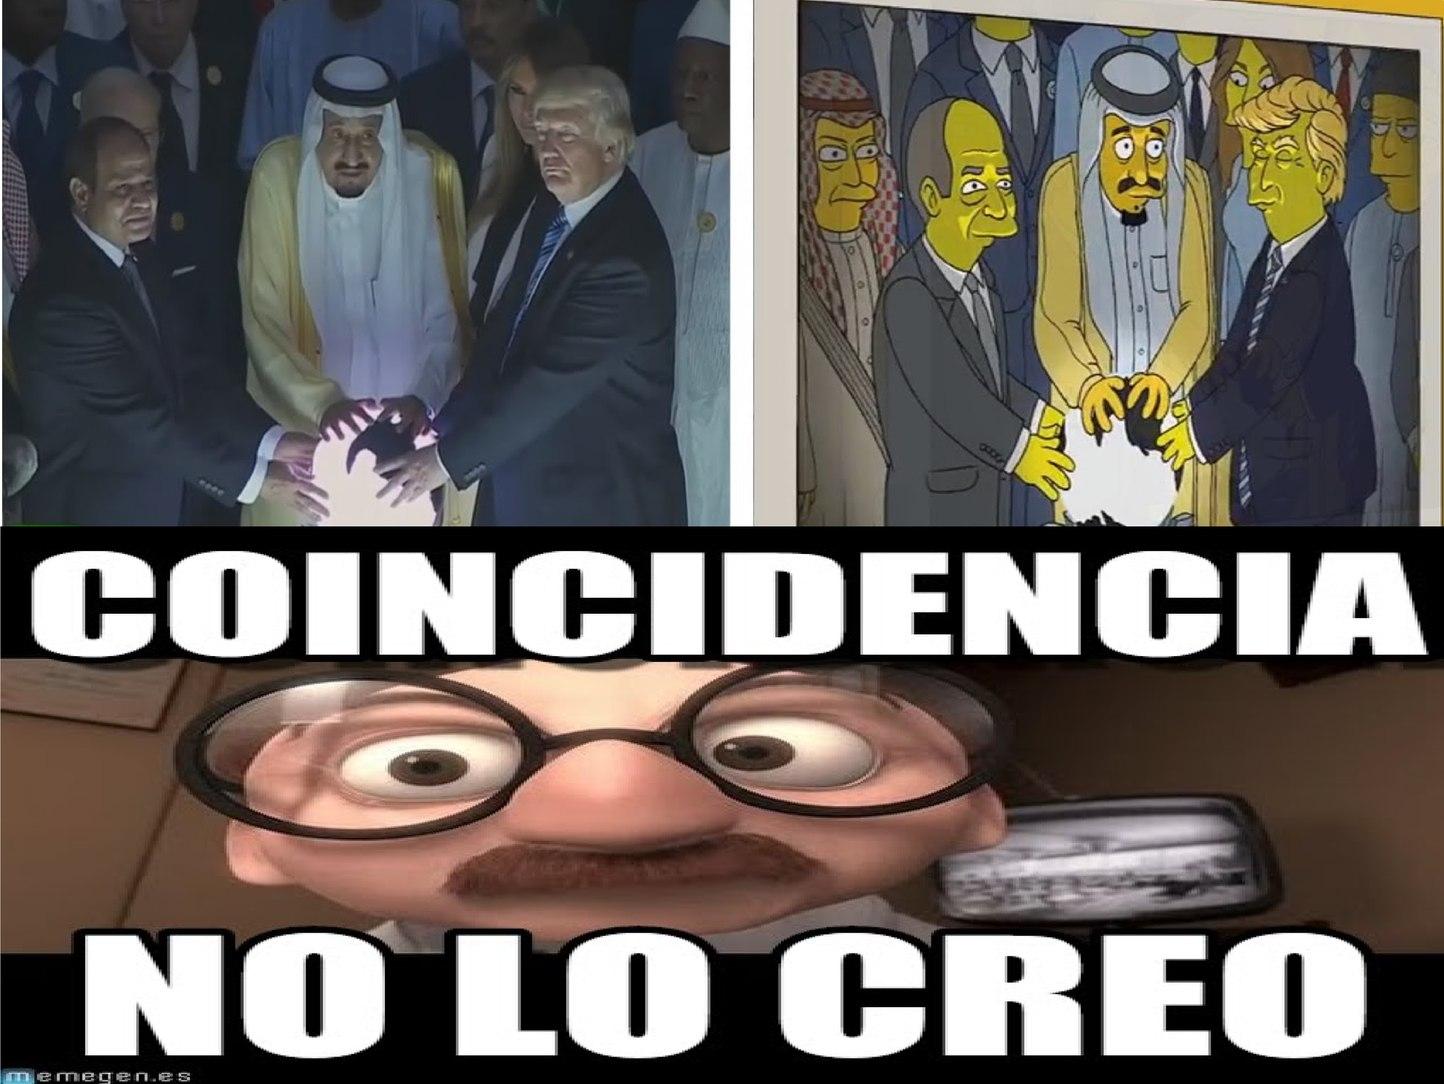 COUNCIDENCIA NO LO CREO - meme